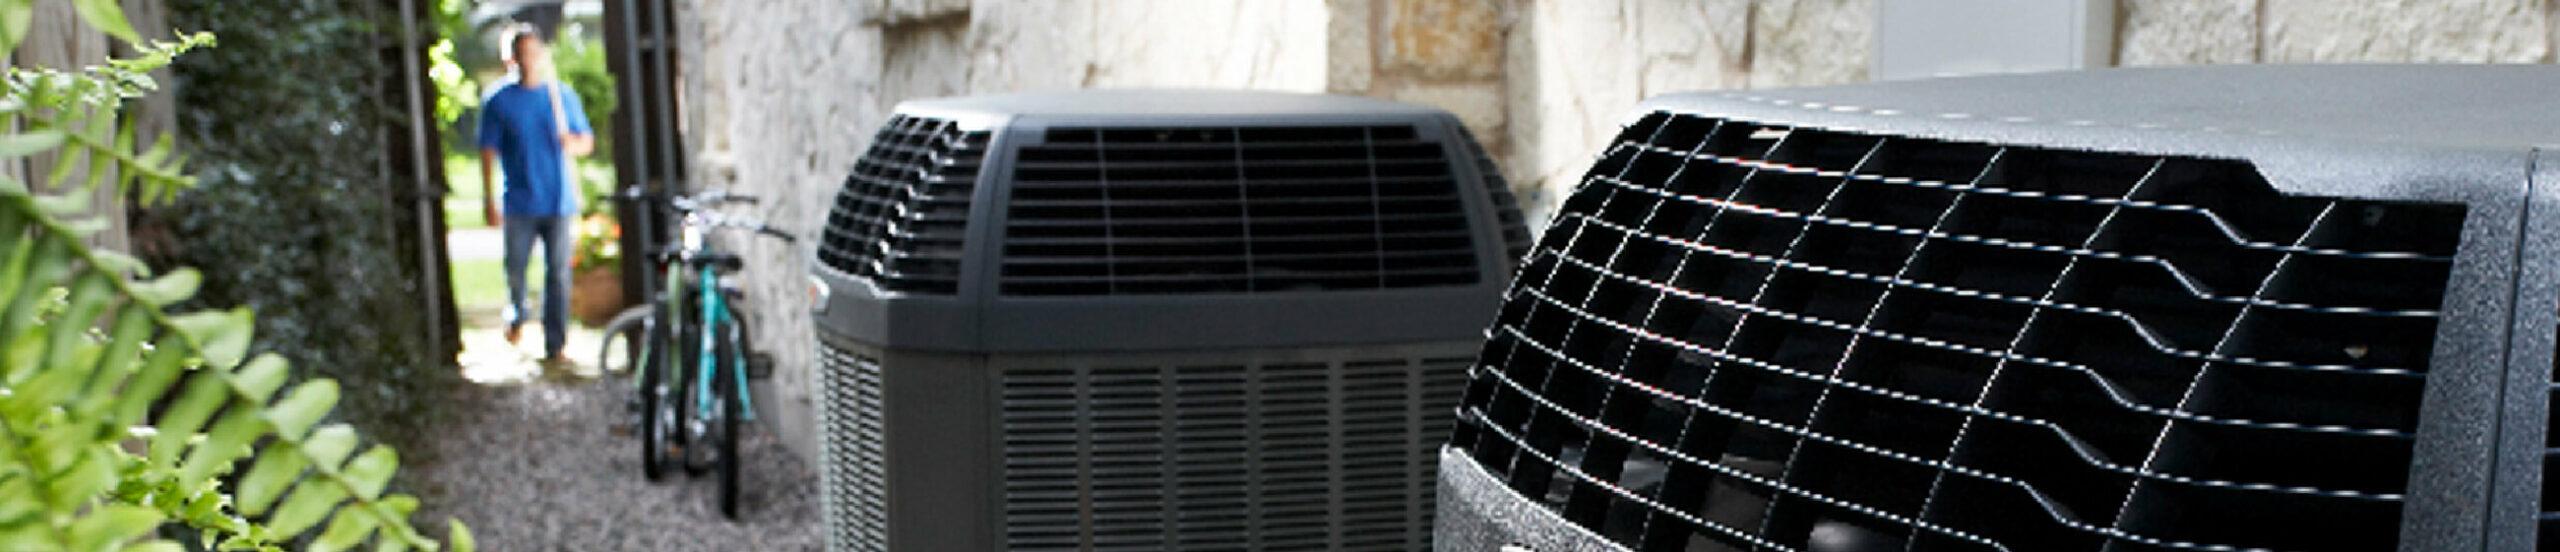 Close up of a Heat Pump unit next to a house